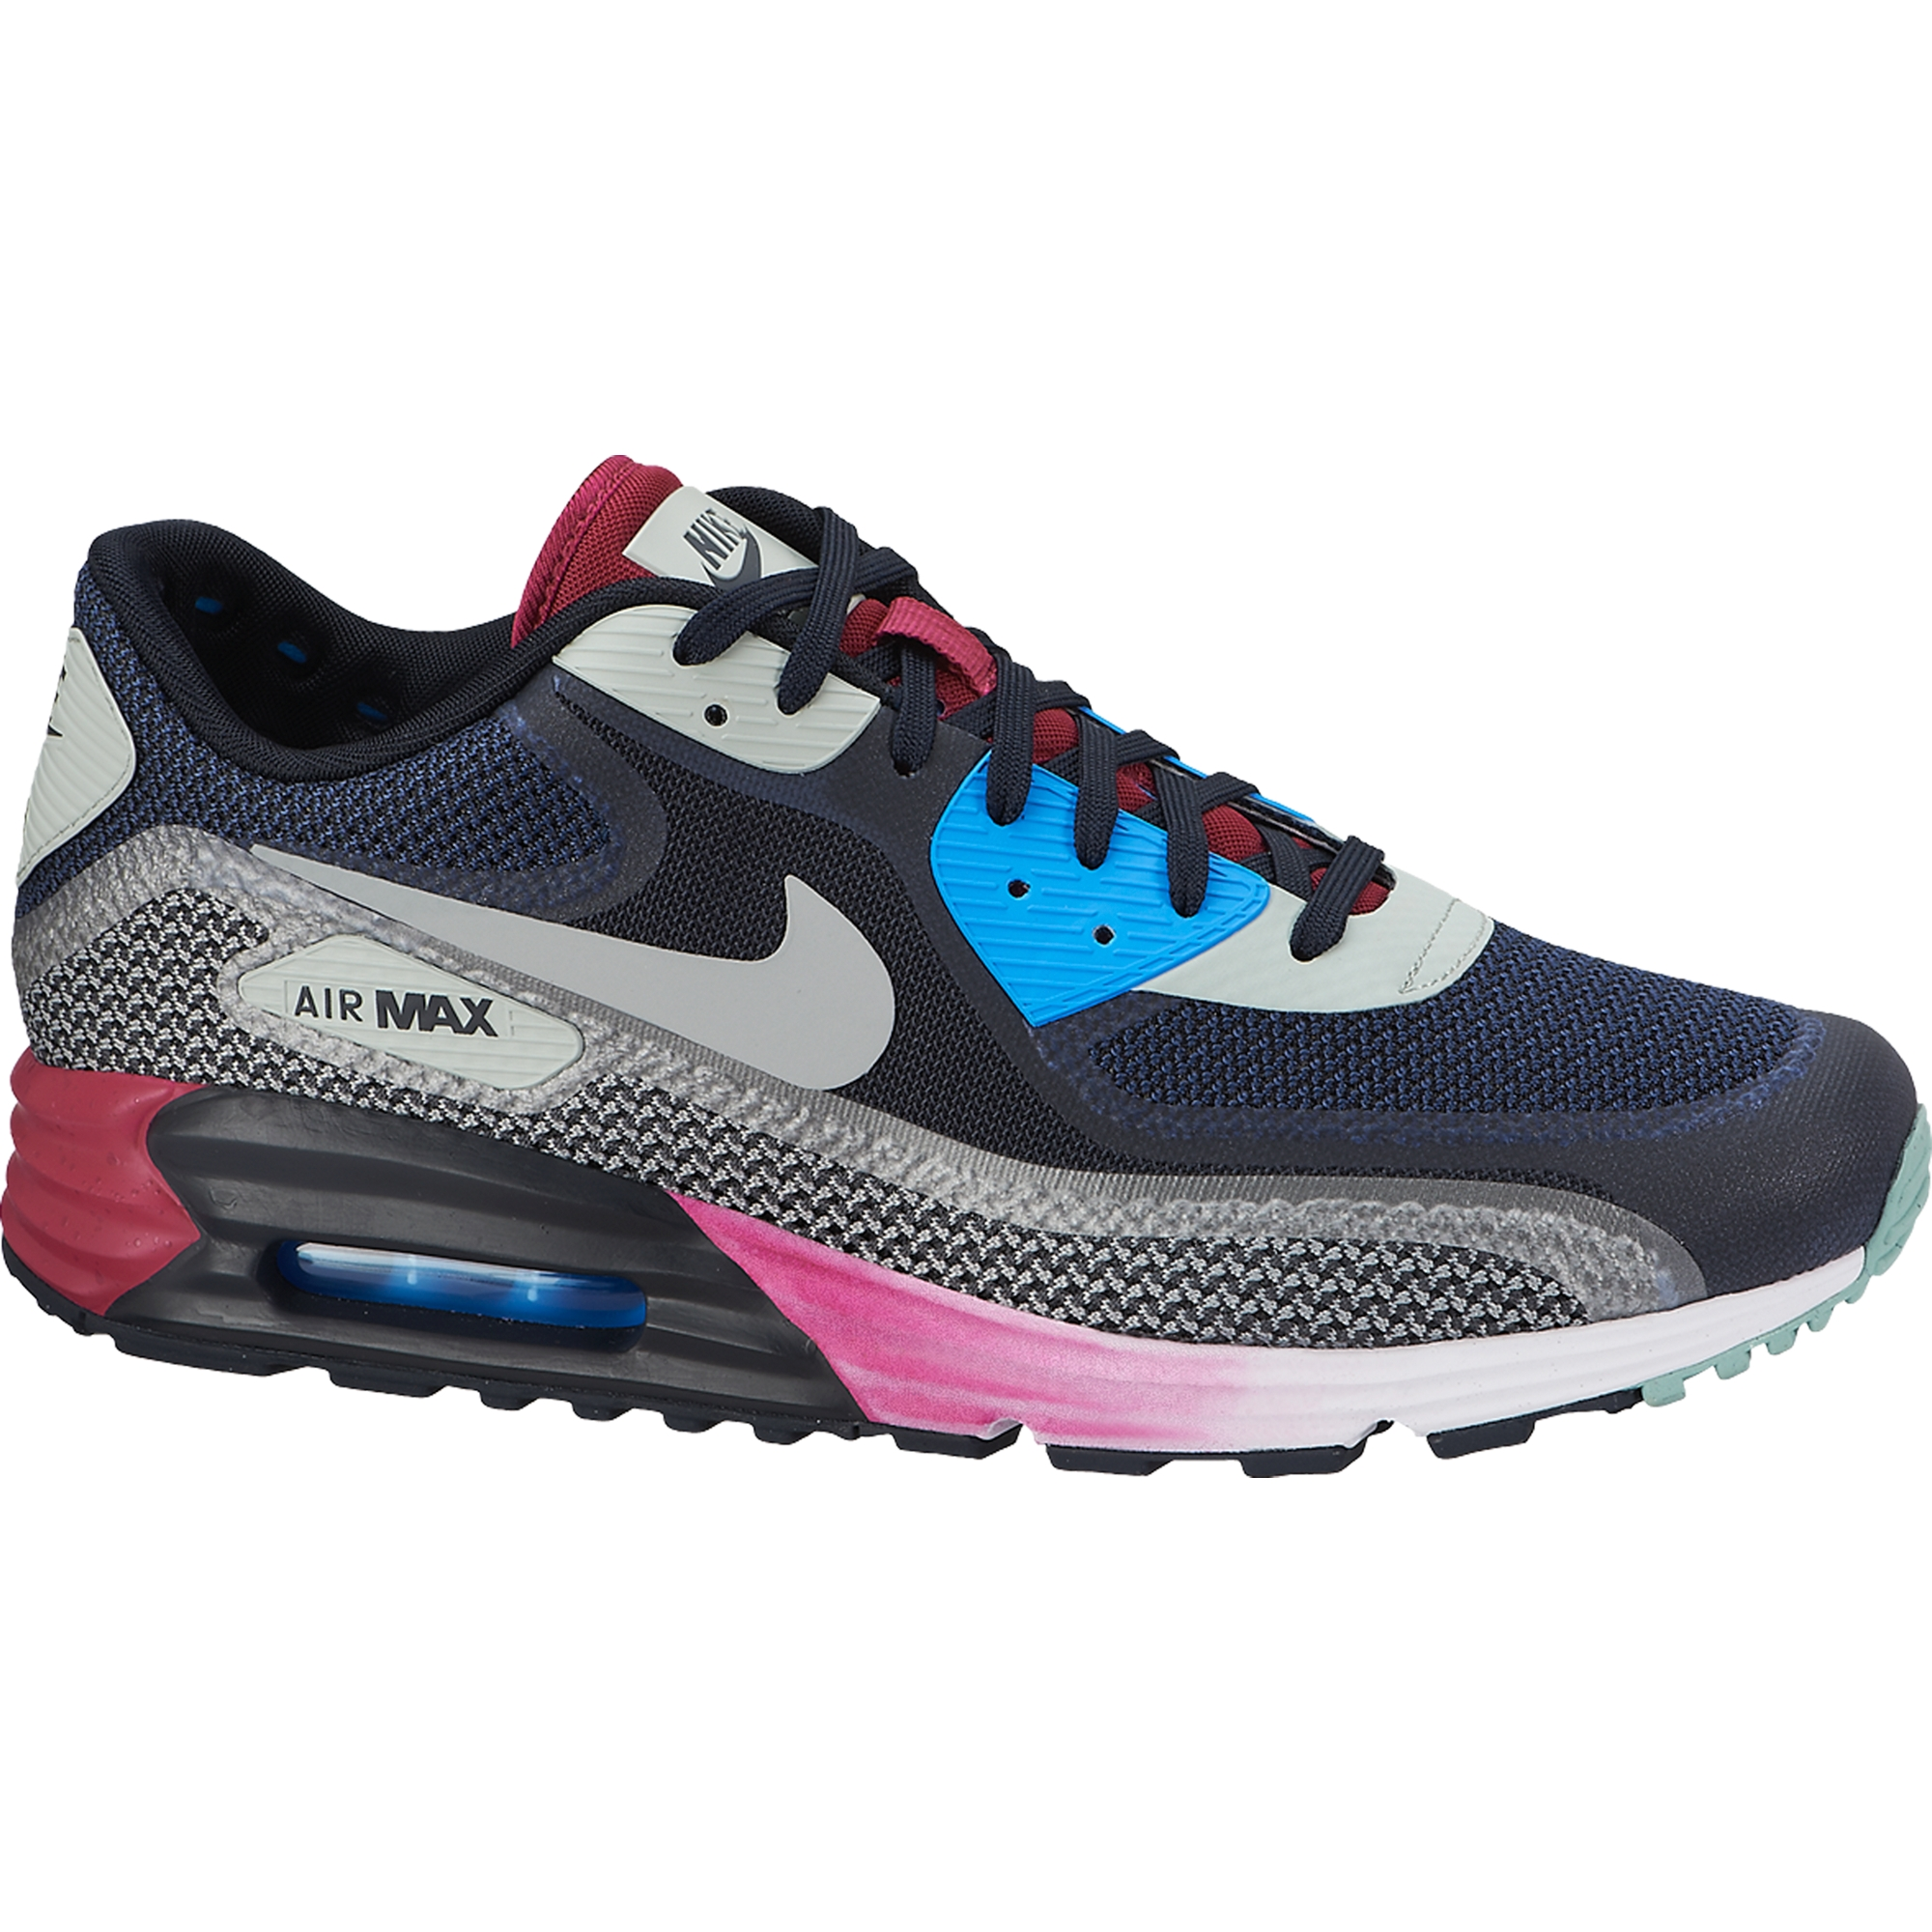 965e44d95142 Nike Air Max Lunar90 C3.0 Erkek Spor Ayakkabı  631744-400 - Barcin.com